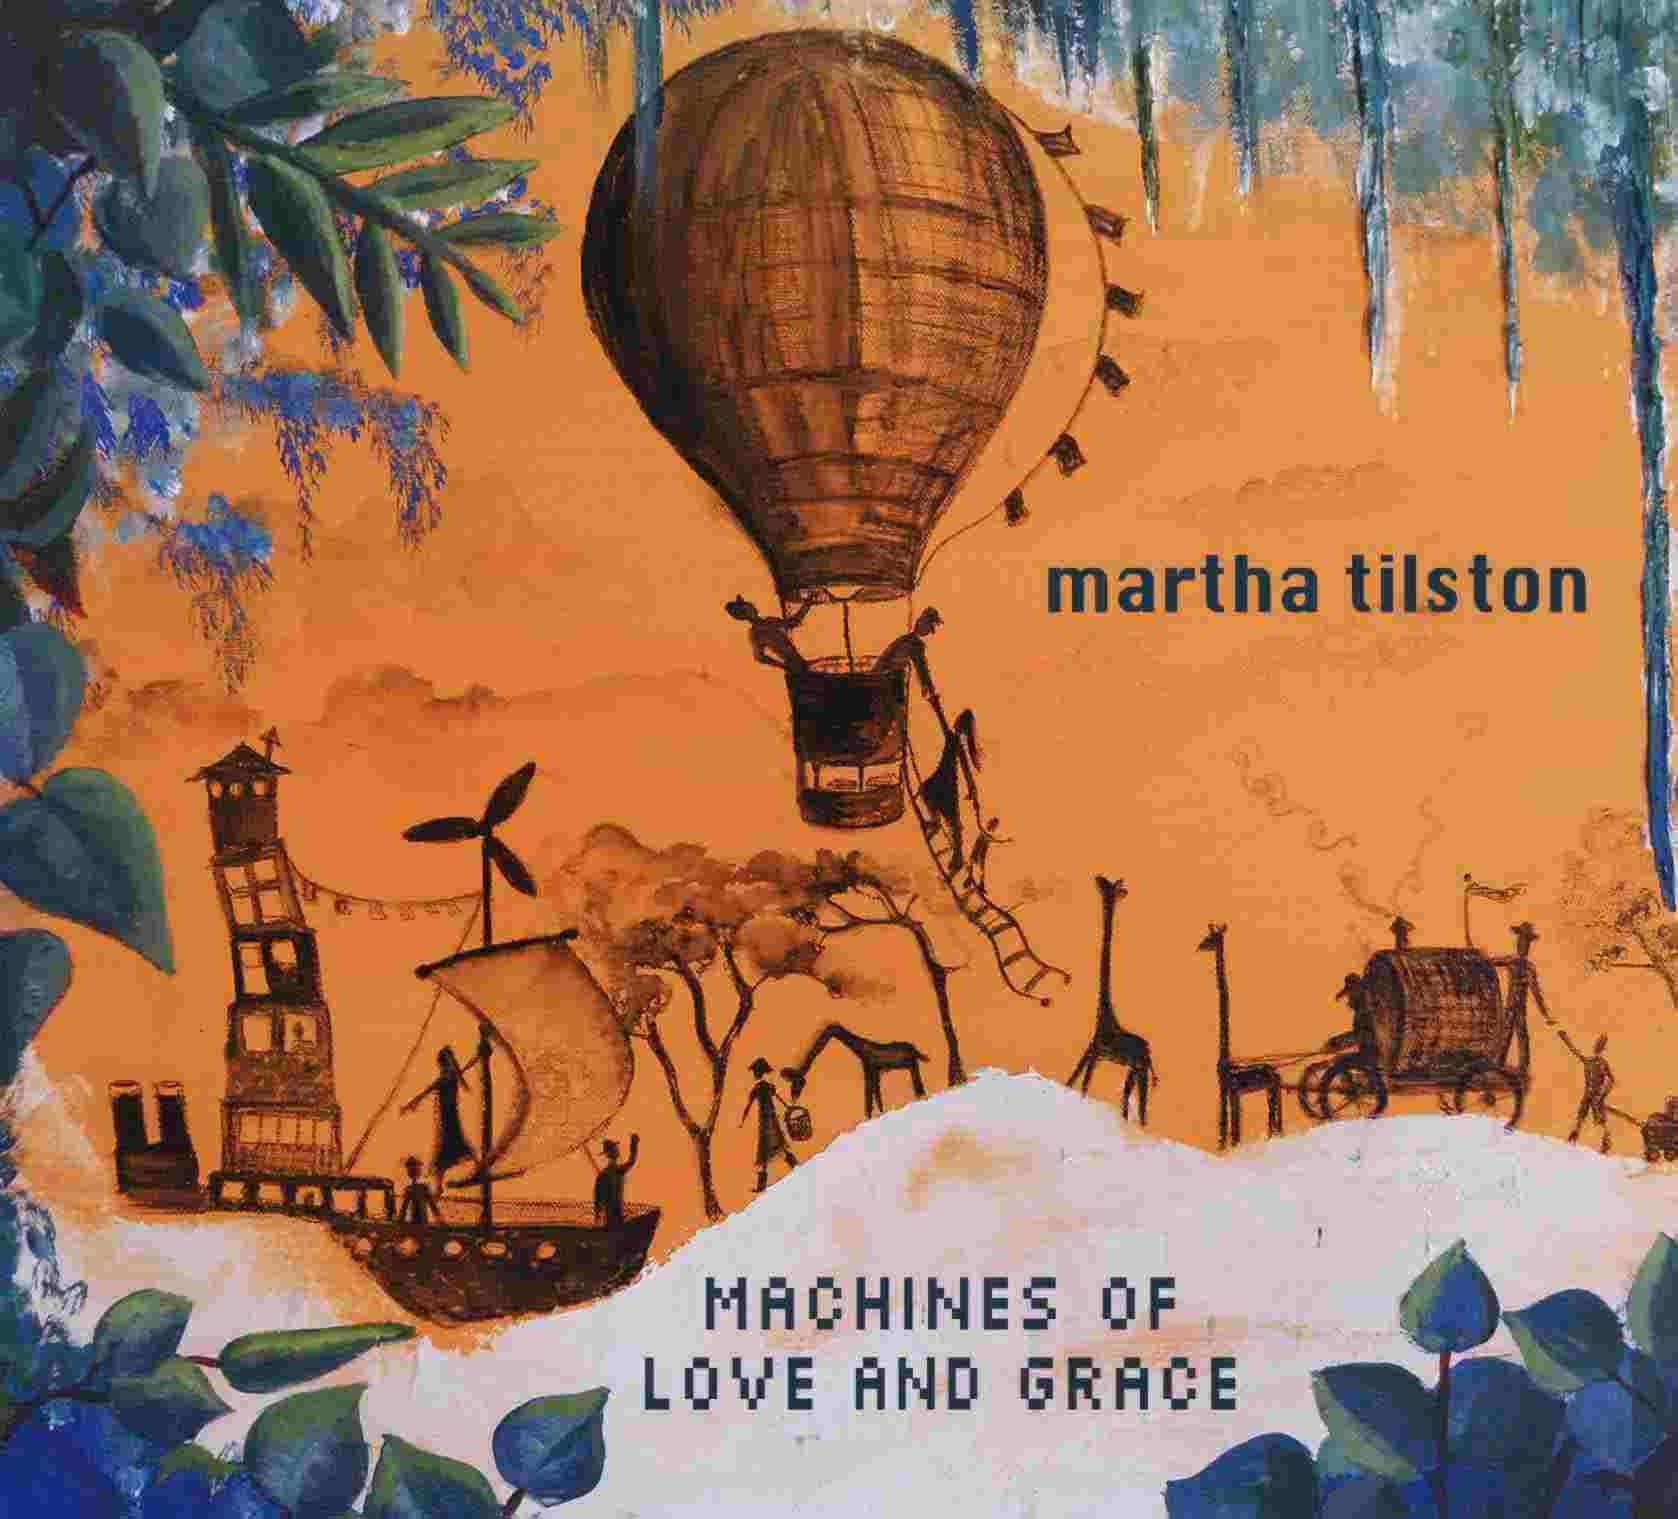 Kitchen Garden Cafe Kings Heath Review Martha Tilston Kitchen Garden Cafac Feb 24th